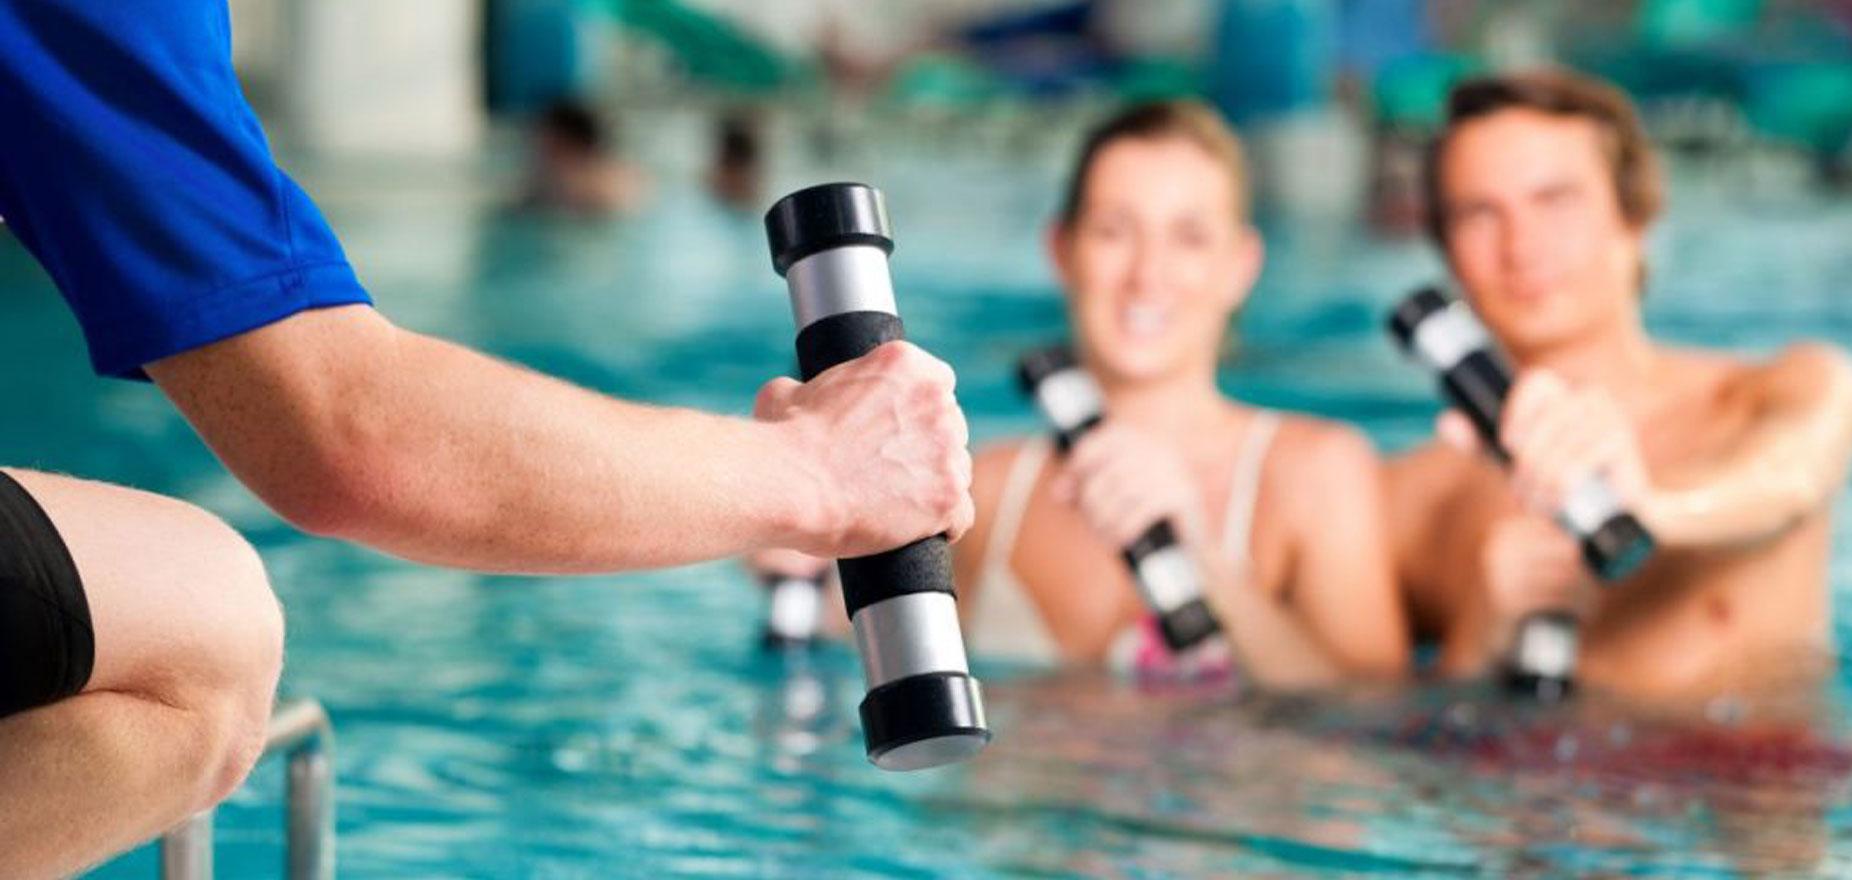 Aquafit Kurs im Lindenbad. Trainer mit Hanteln